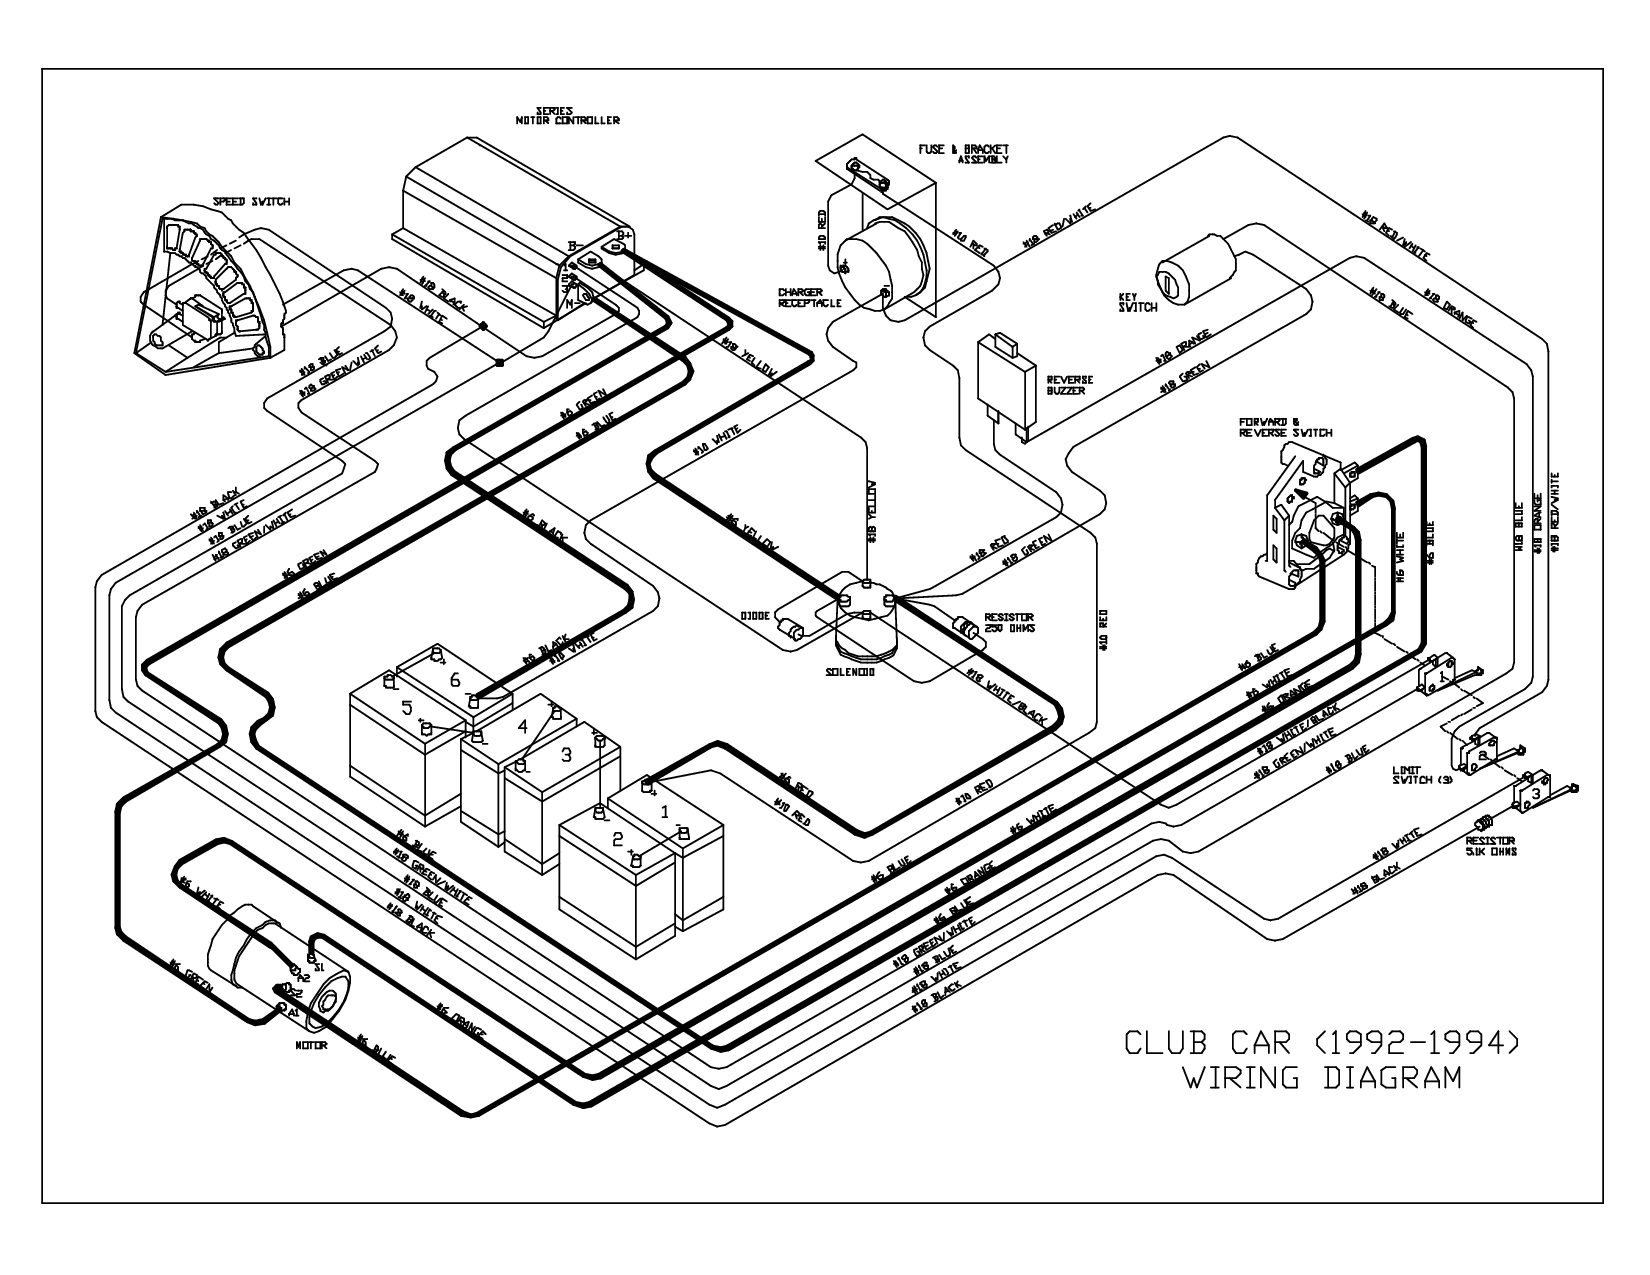 electric golf cart fuses diagrams b94e8 48v golf cart wiring diagram wiring library  b94e8 48v golf cart wiring diagram